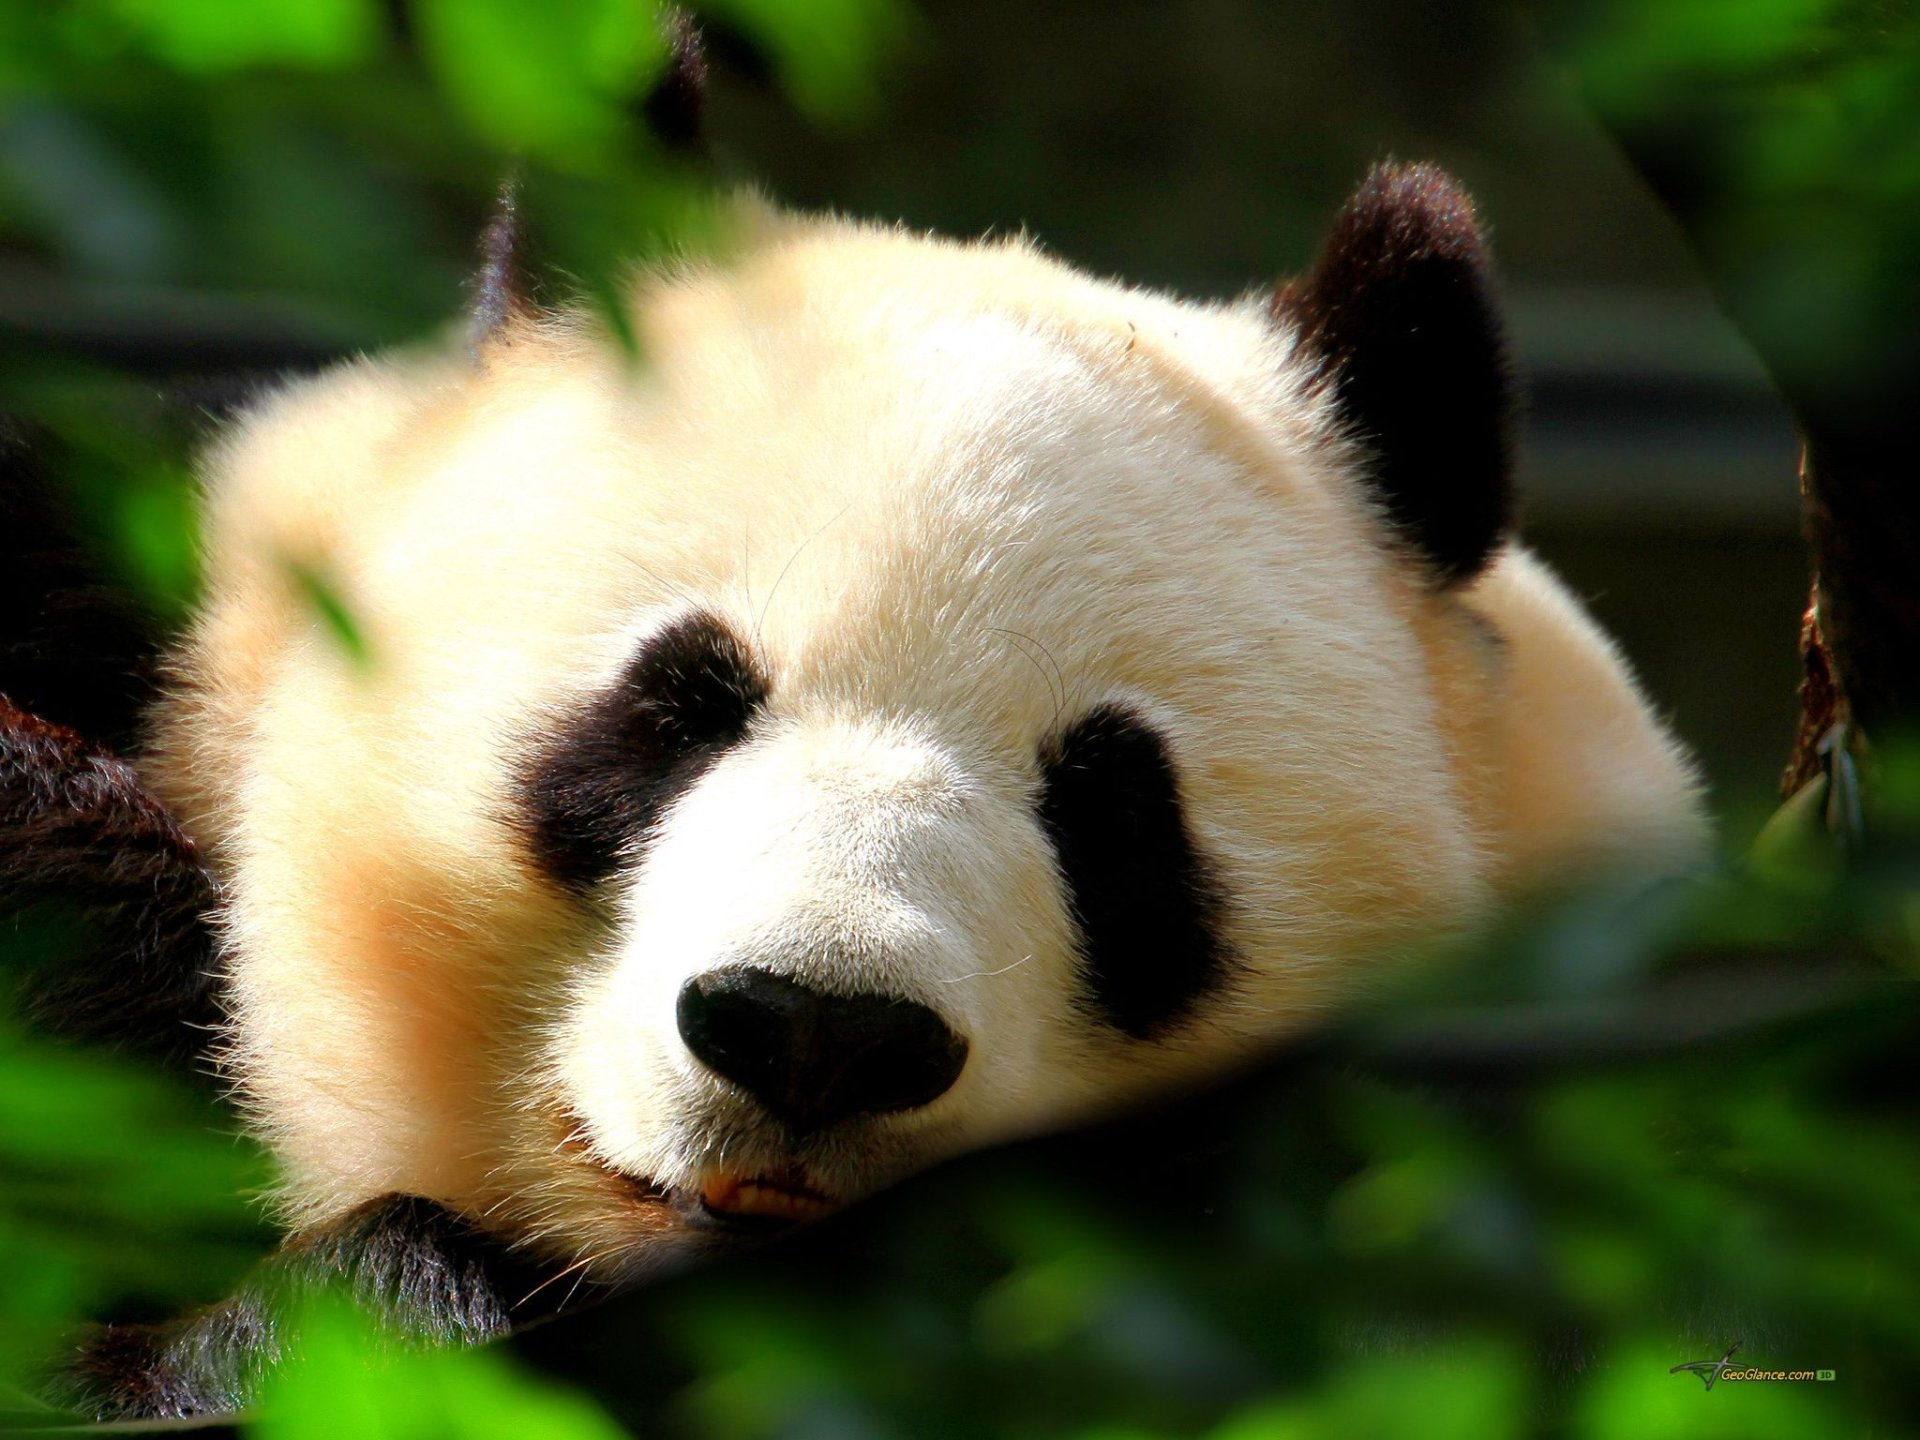 Panda Fond d'écran HD | Arrière-Plan | 2048x1536 | ID:363133 - Wallpaper Abyss